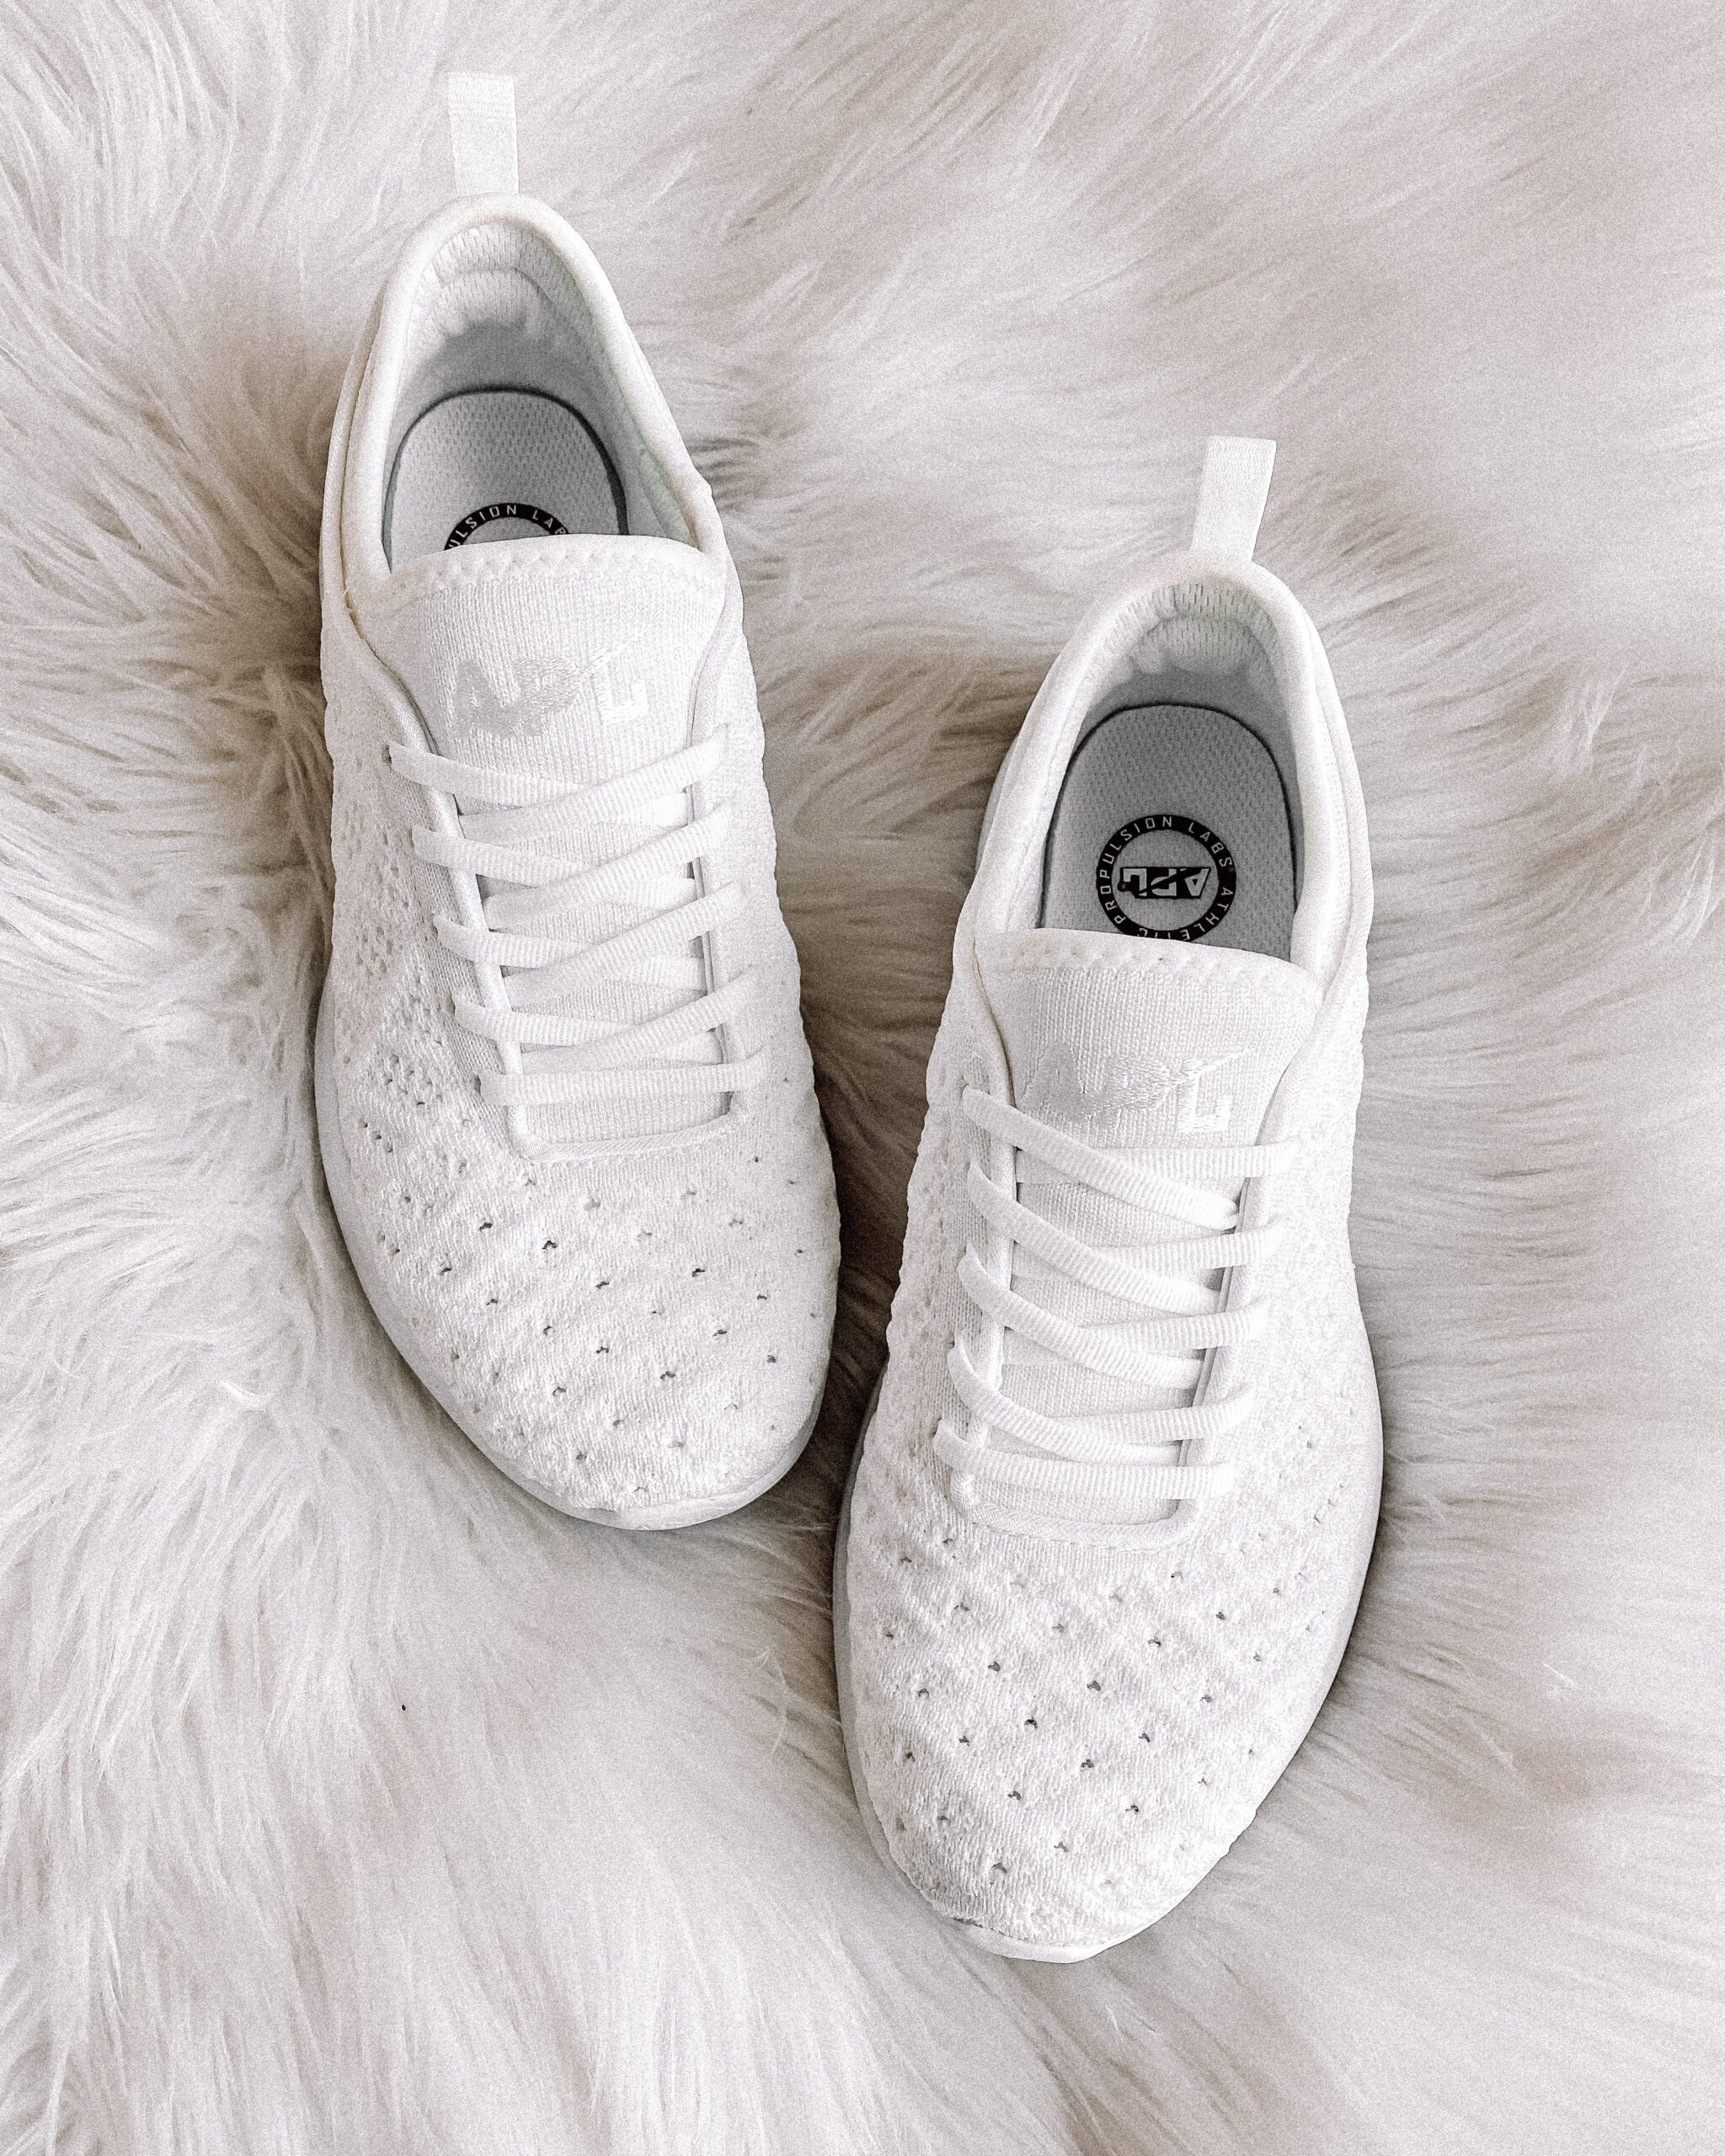 Fashion Jackson APL White Sneakers Shopbop